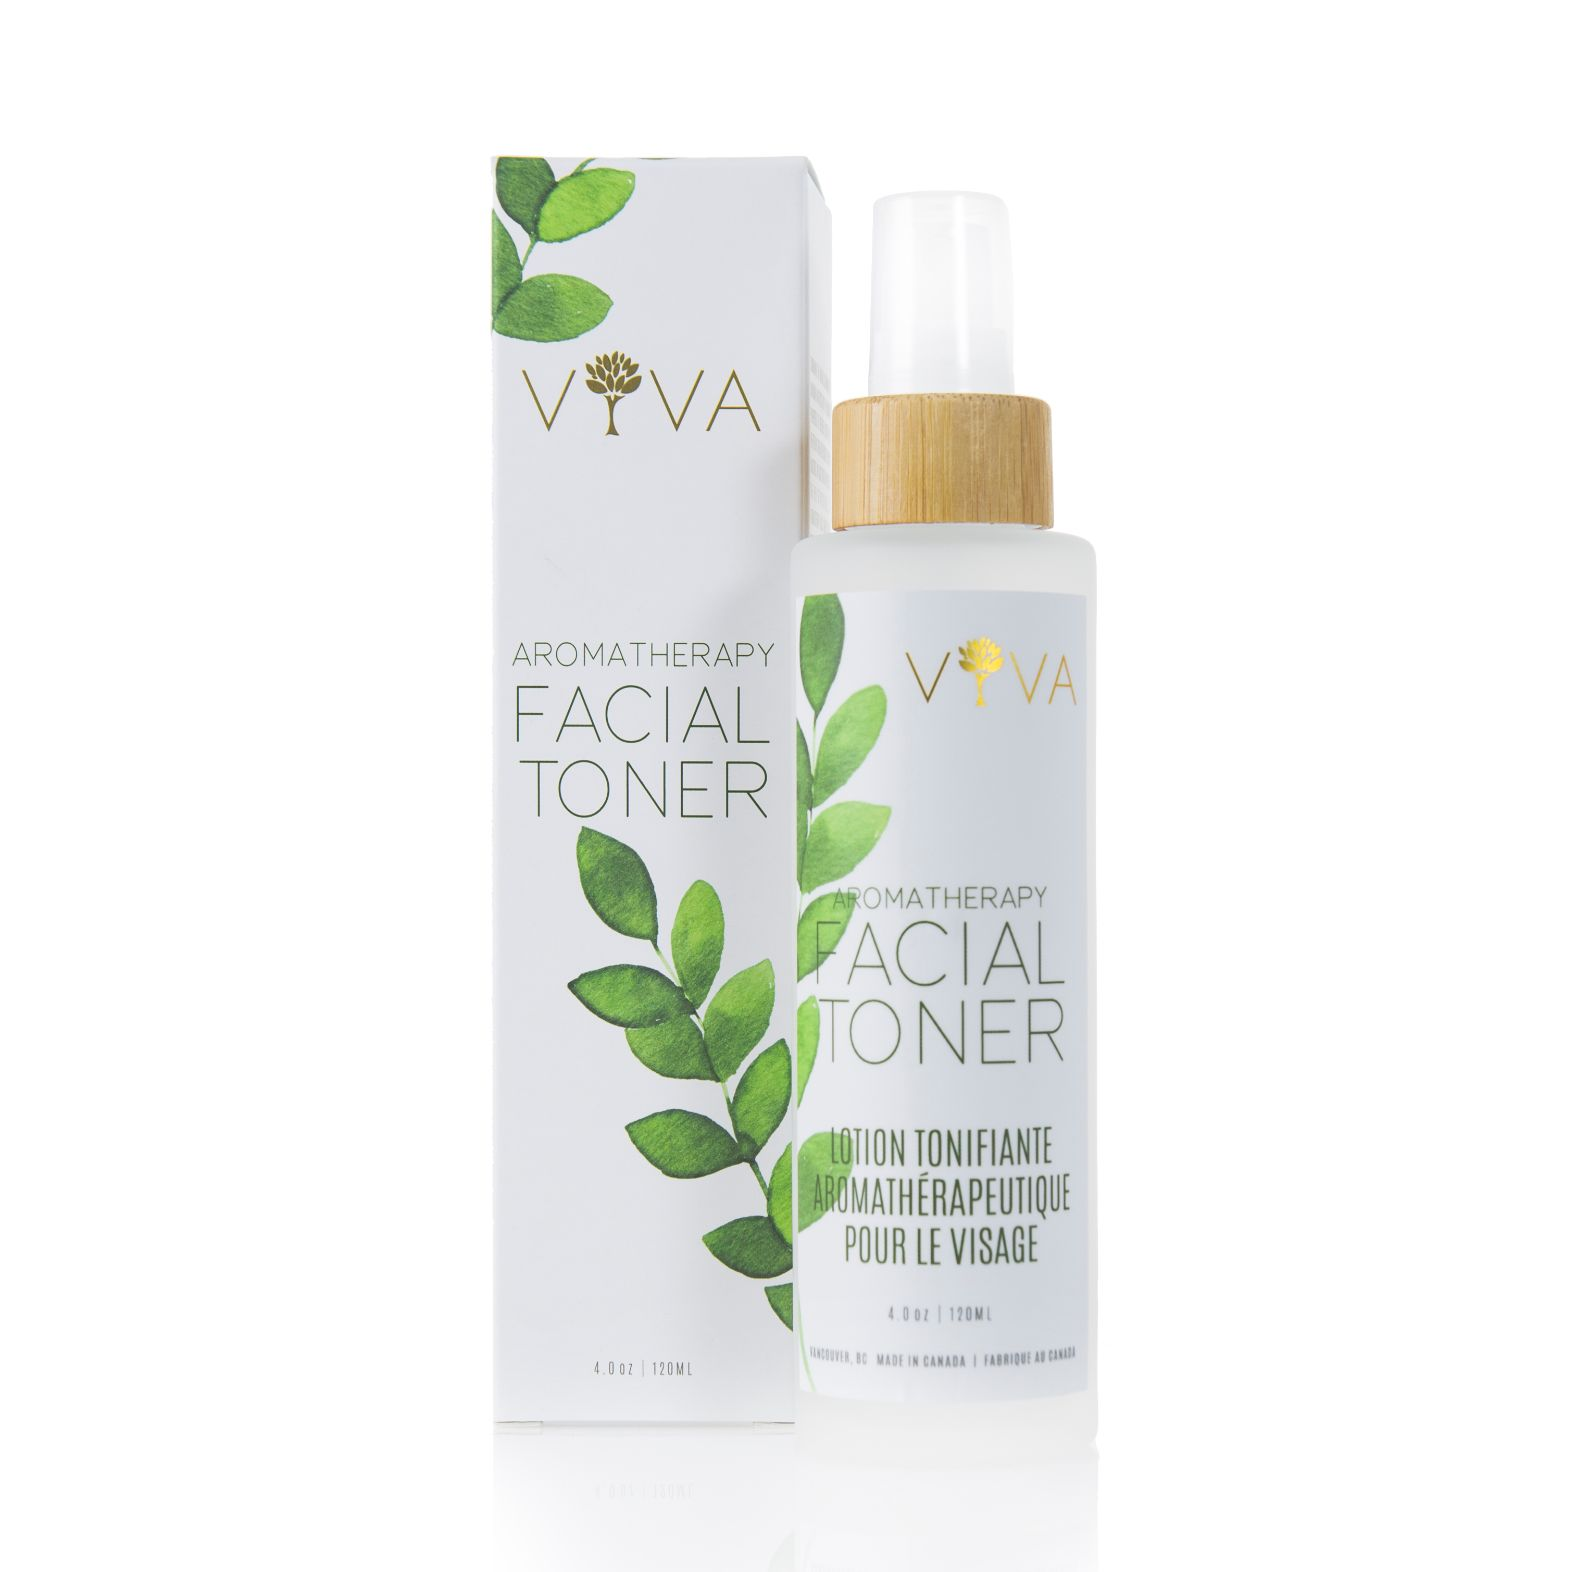 Viva Organics Aromatherapy Facial Mist